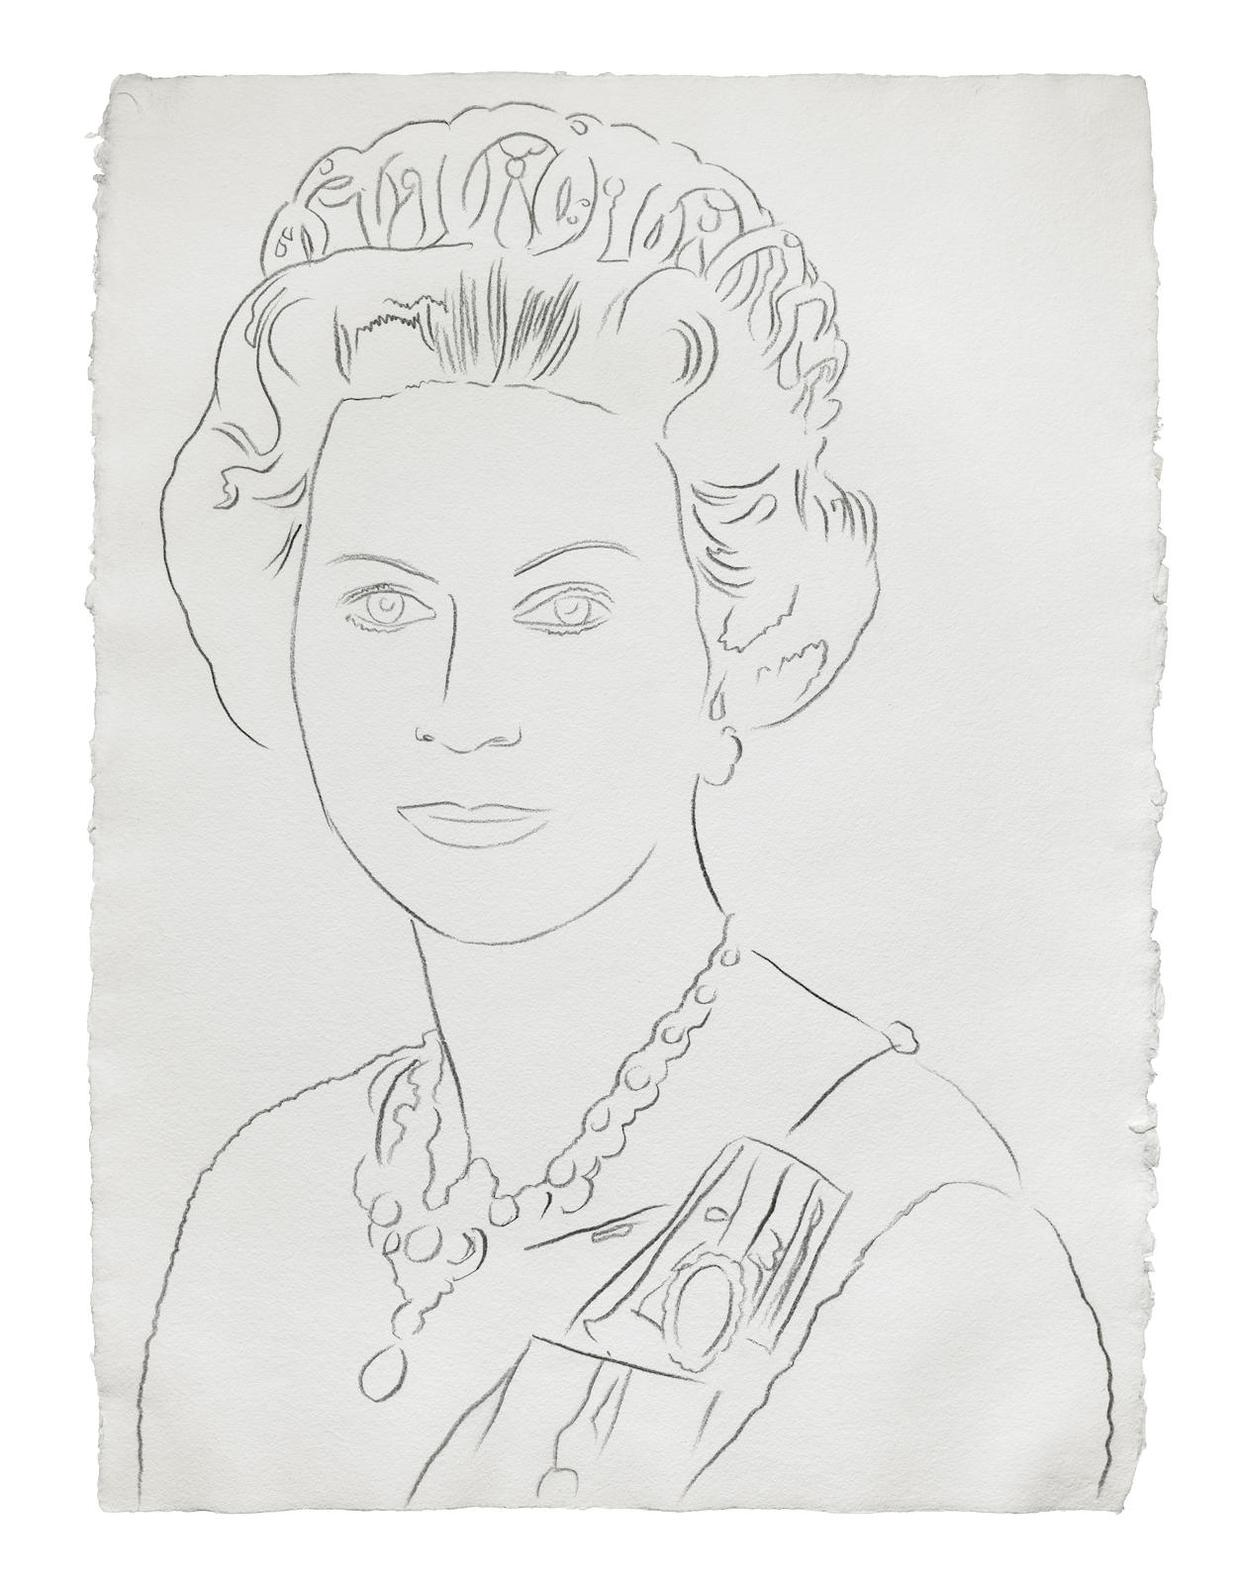 Andy Warhol-Reigning Queens: Queen Elizabeth II Of The United Kingdom-1985